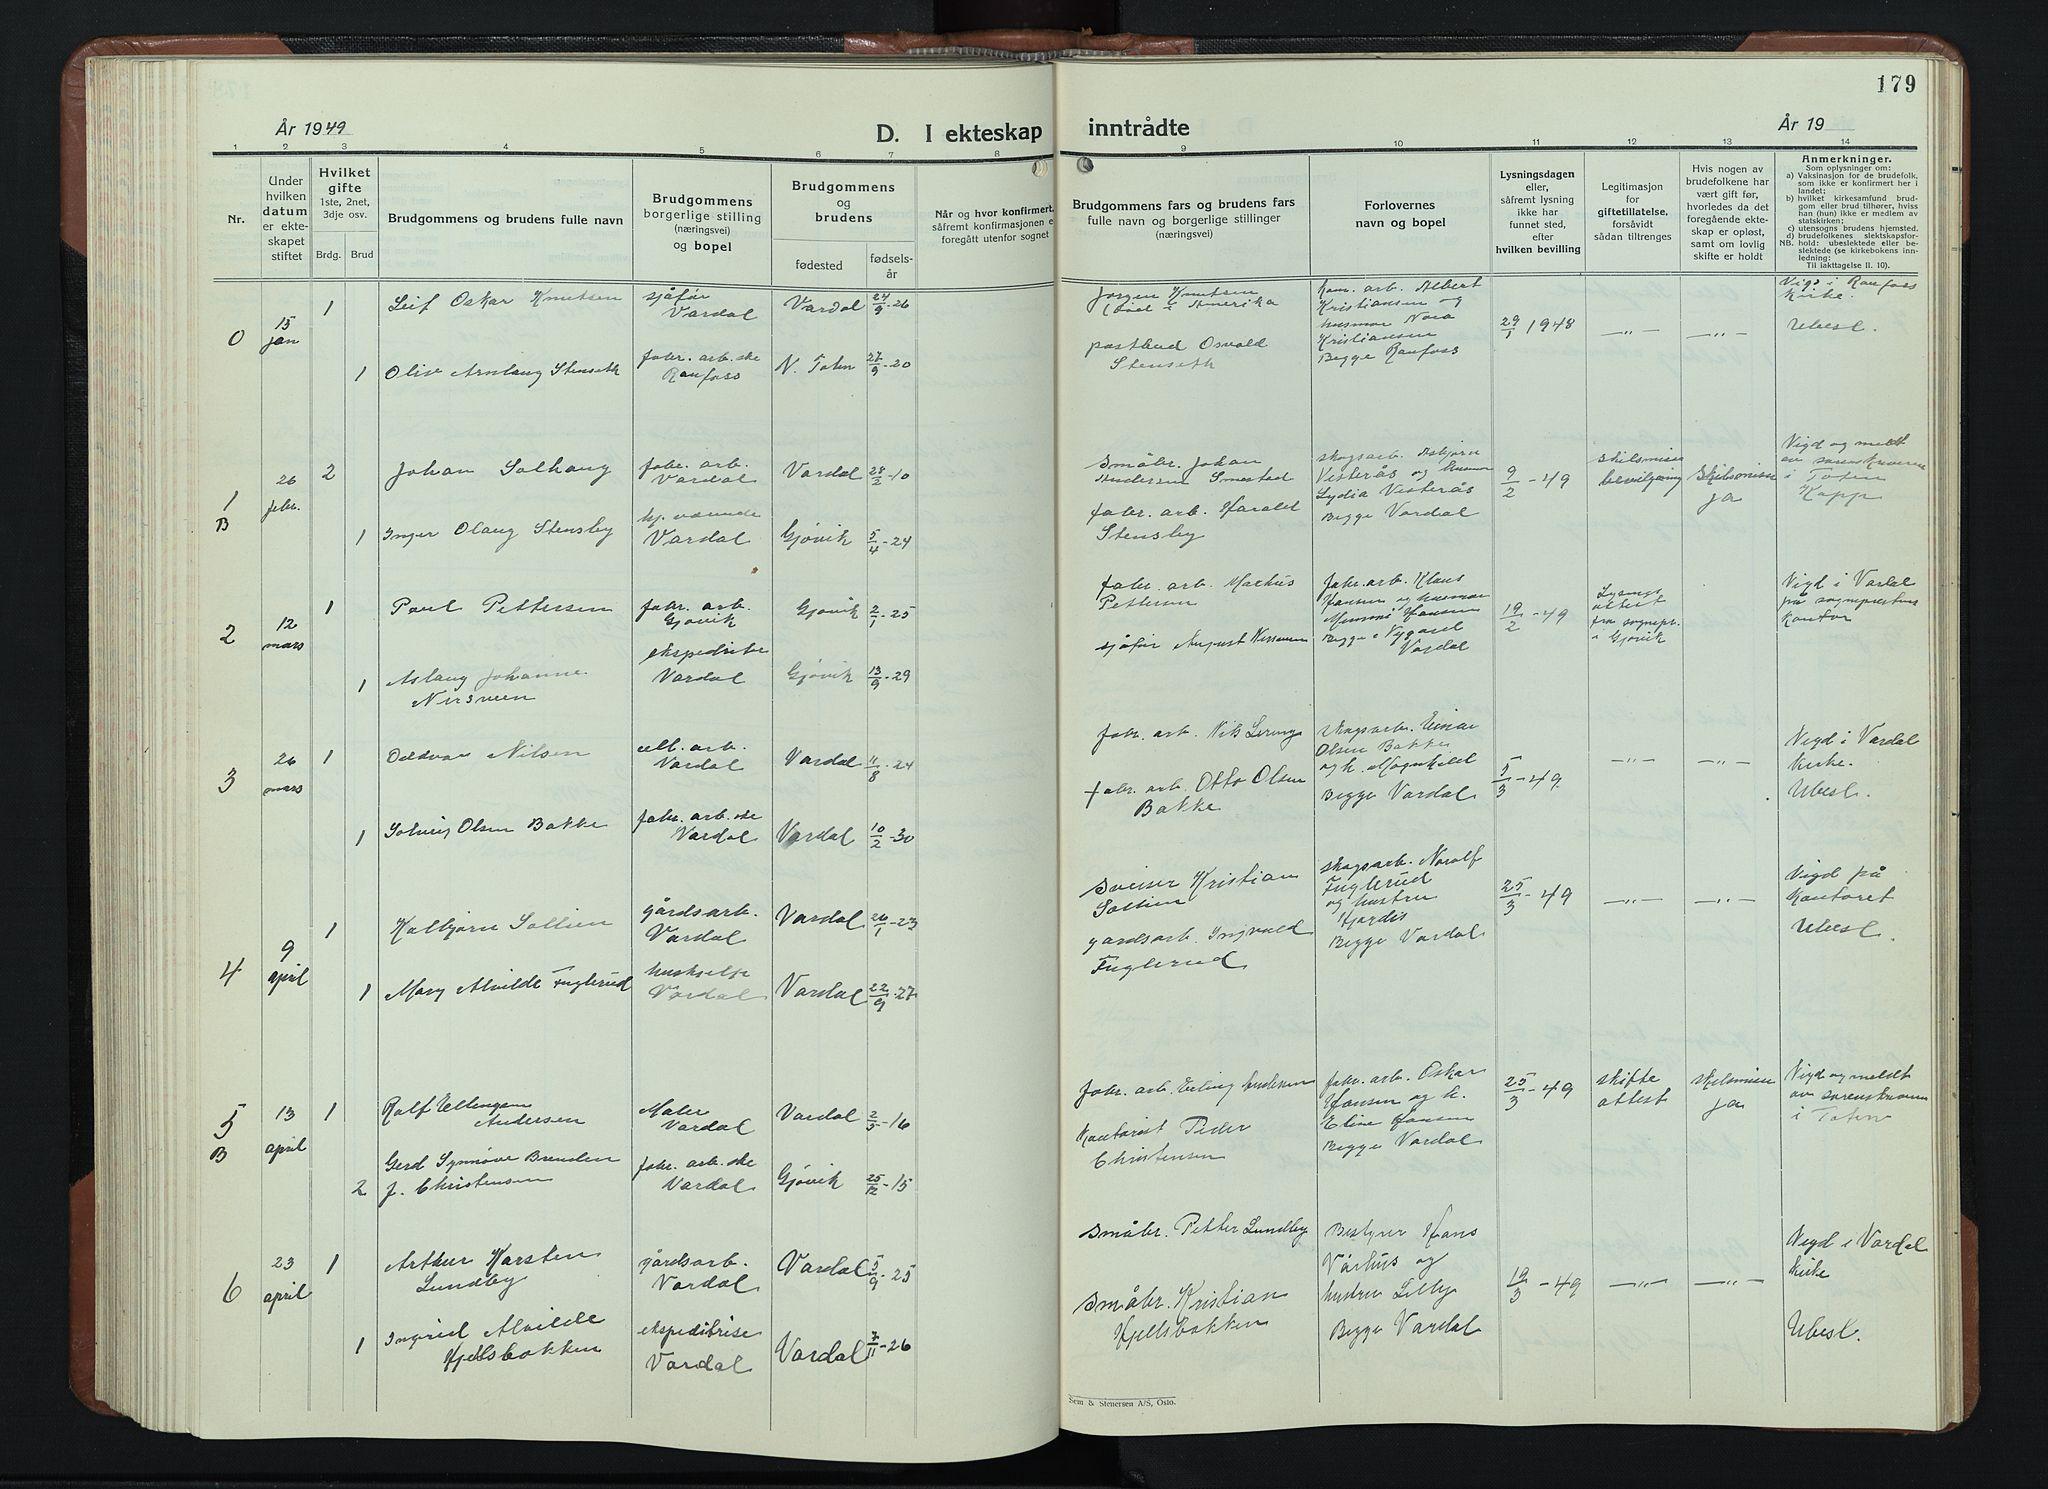 SAH, Vardal prestekontor, H/Ha/Hab/L0018: Klokkerbok nr. 18, 1931-1951, s. 179